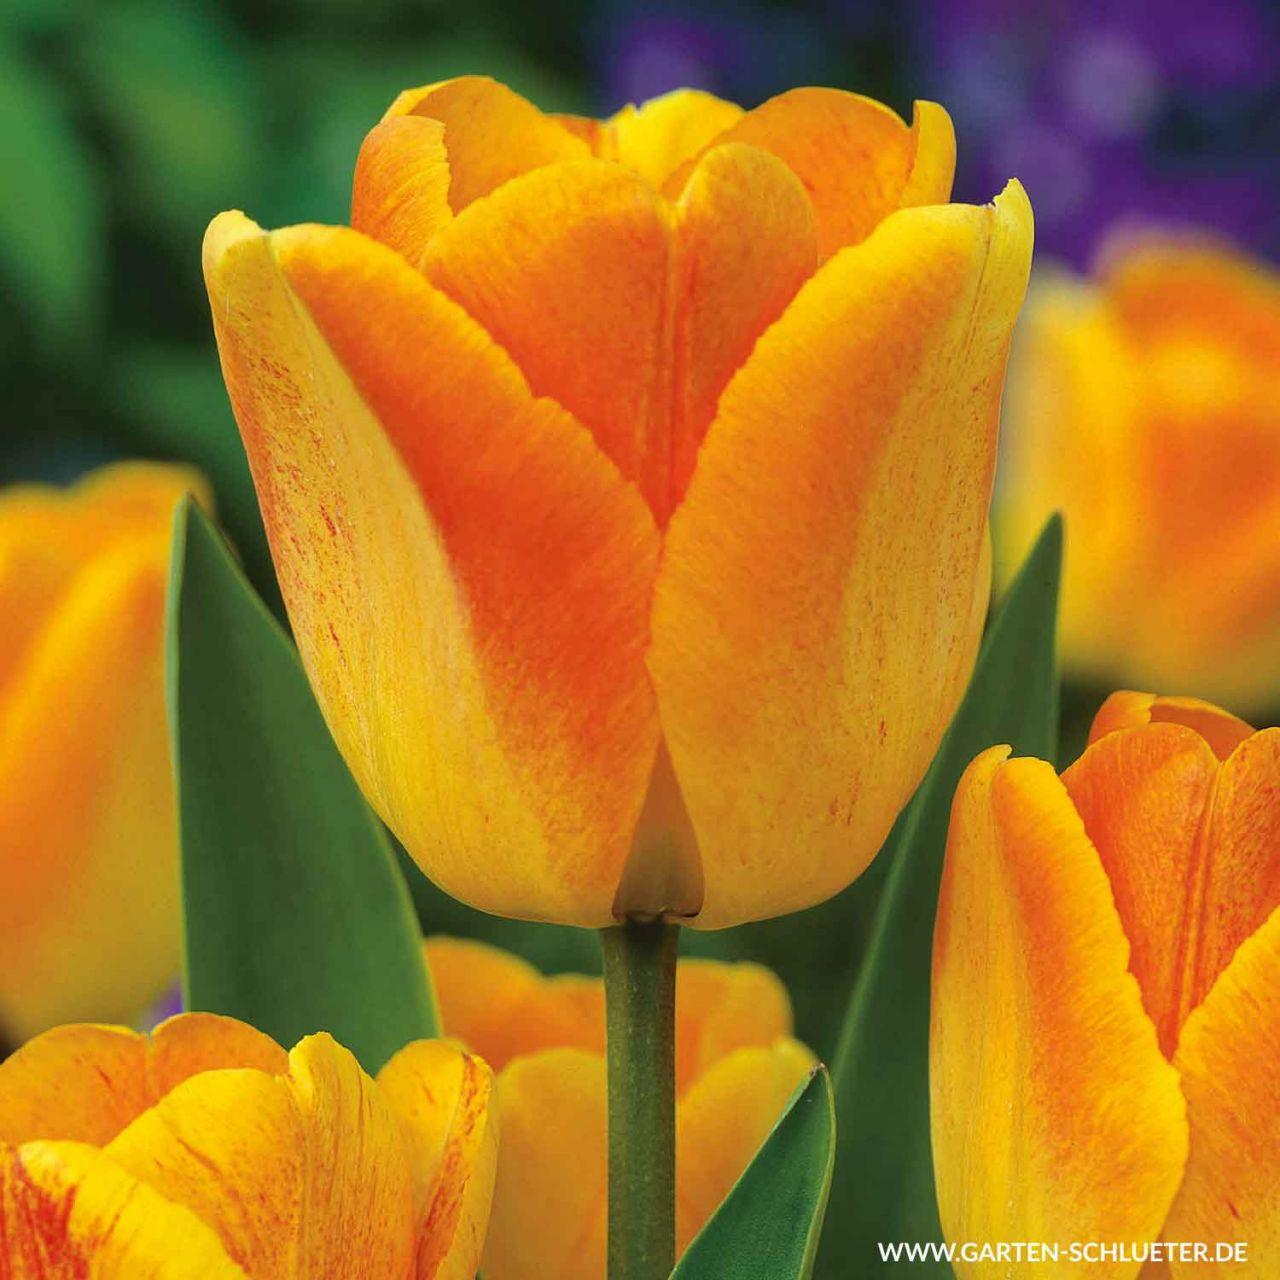 Einfache späte Tulpe 'Rhapsody of Smiles' - 7 Stück